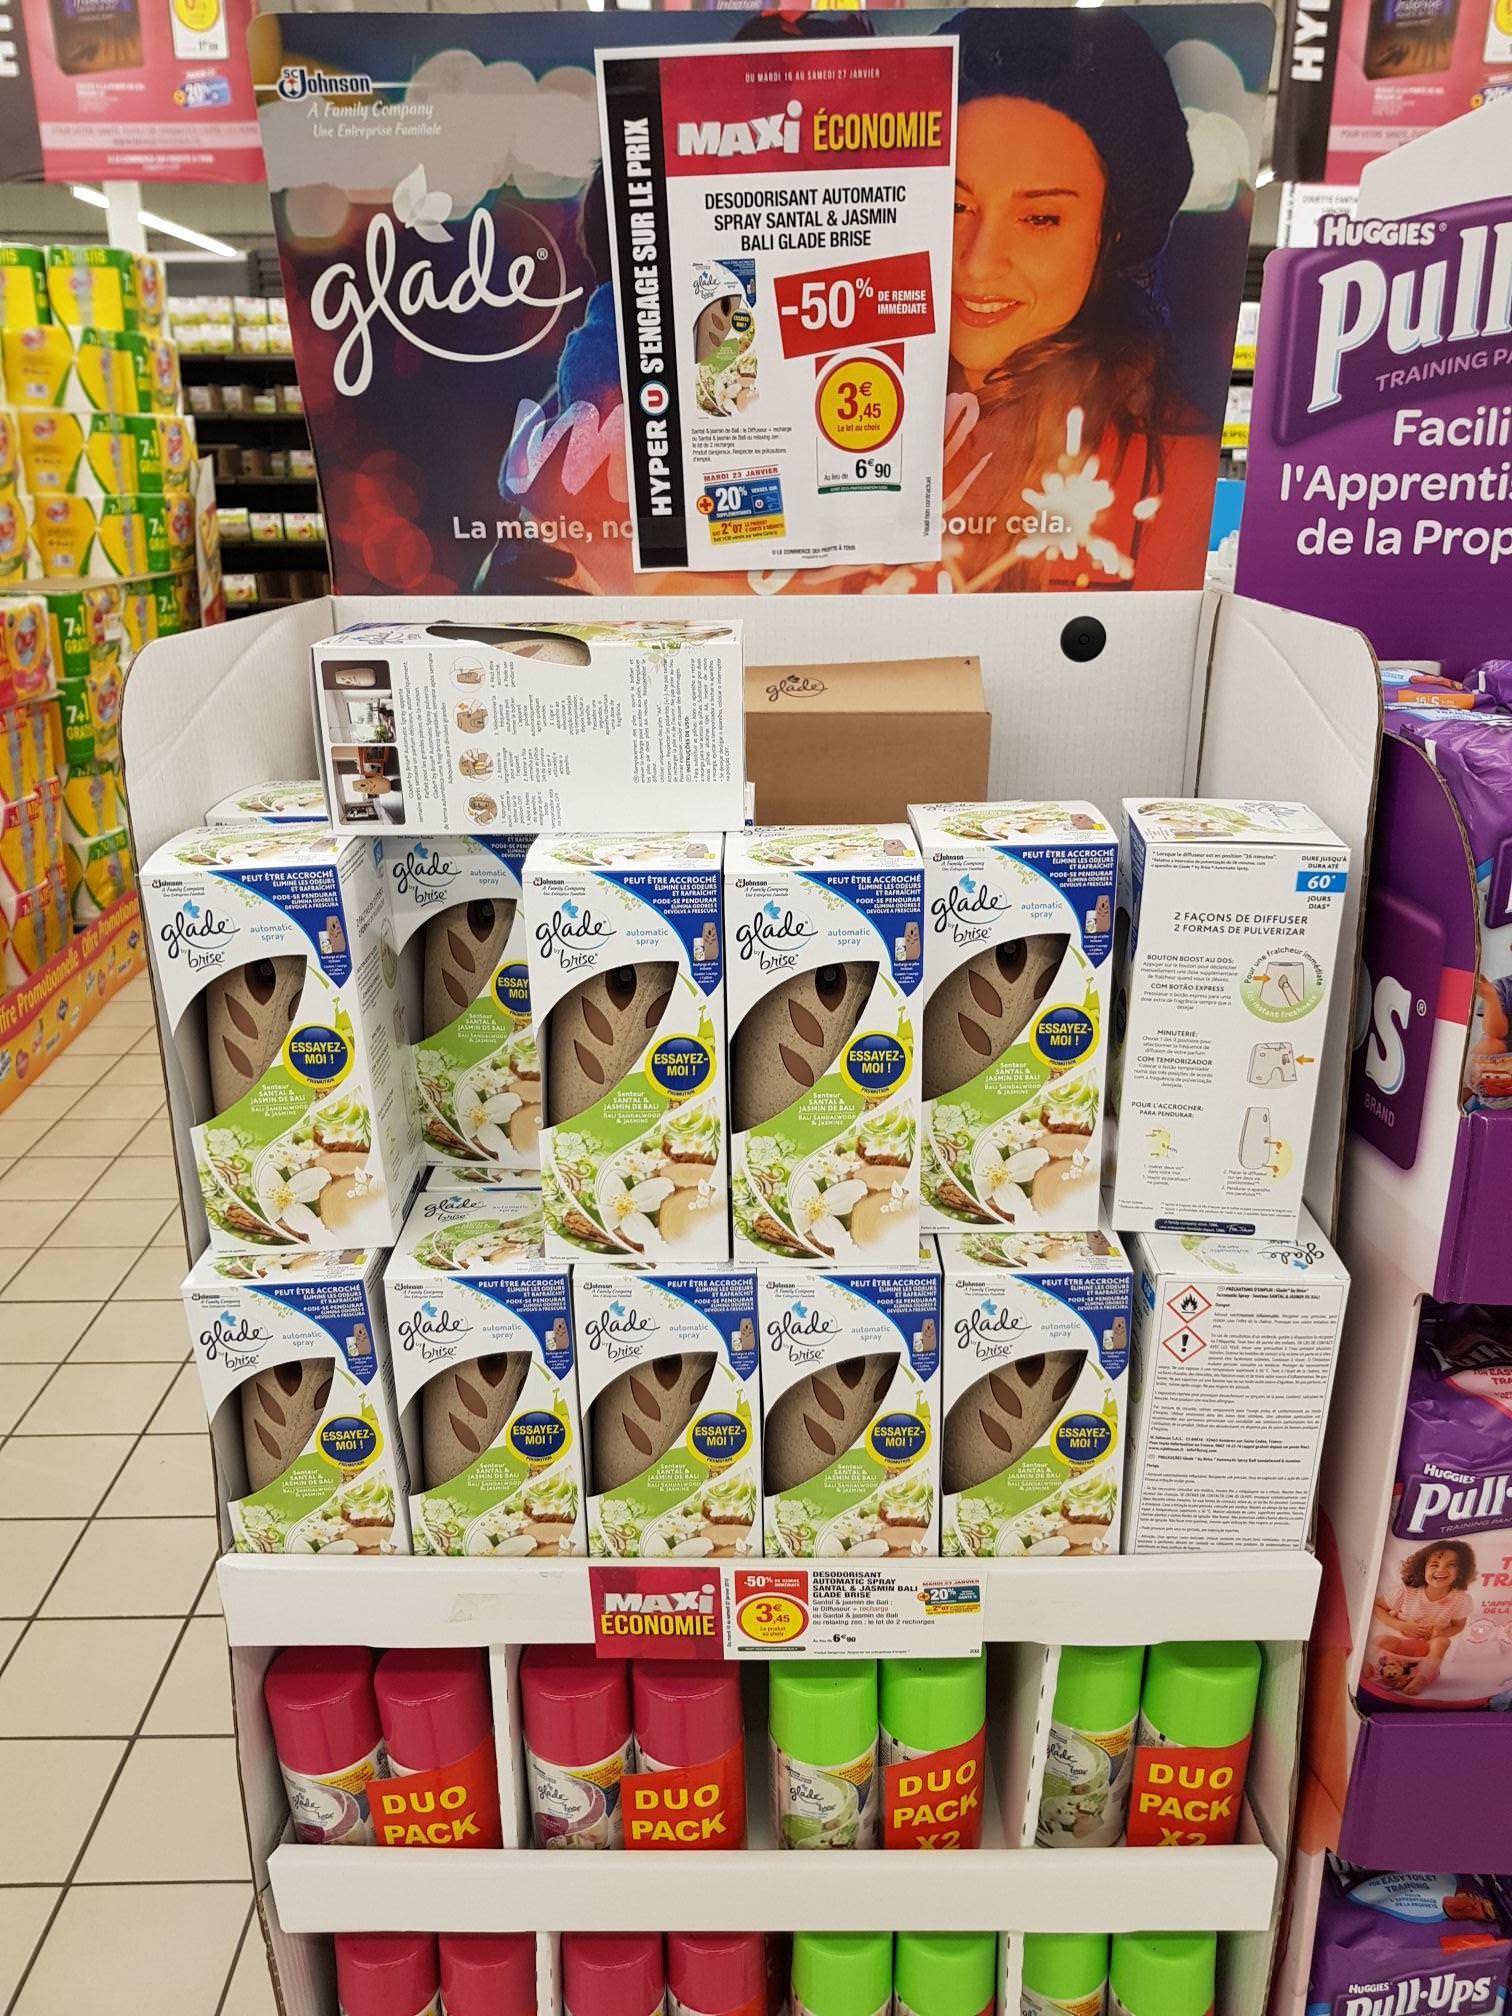 Spray désodorisant Glade Automatic - Santal & Jasmin de Bali (via Shopmium) au Hyper U Puilboreau (17)